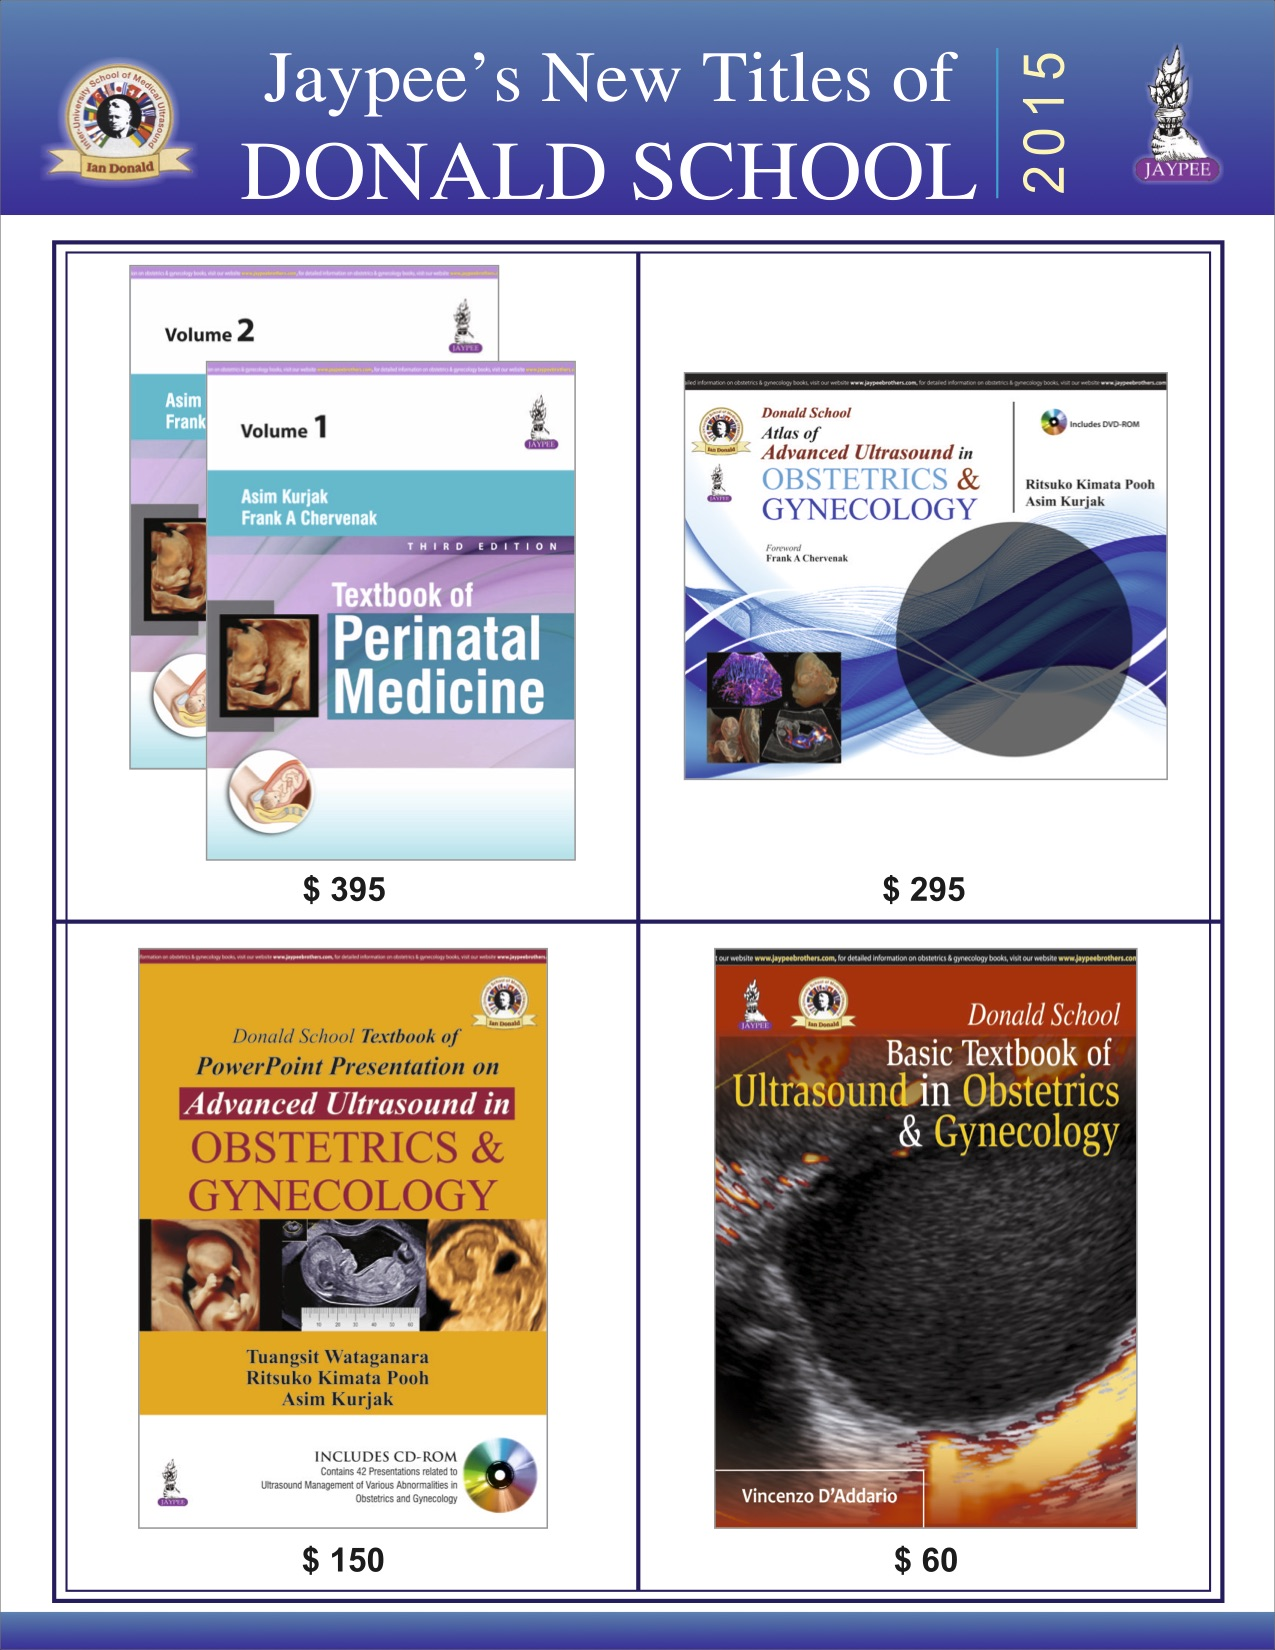 Ina Donald School Books from Jaypee